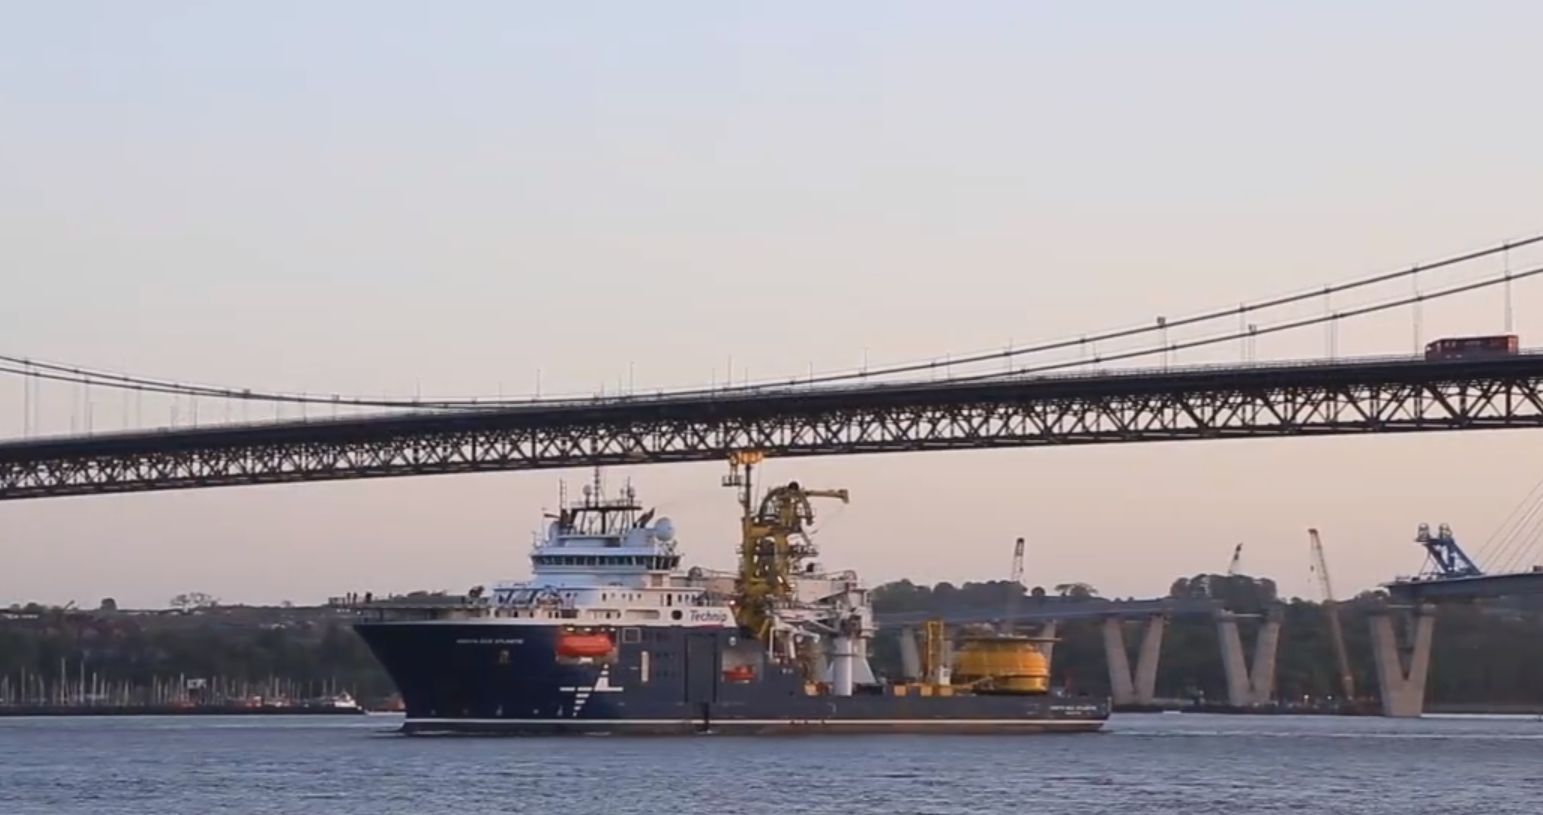 The North Sea Atlantic vessel passing below the Forth Road Bridge